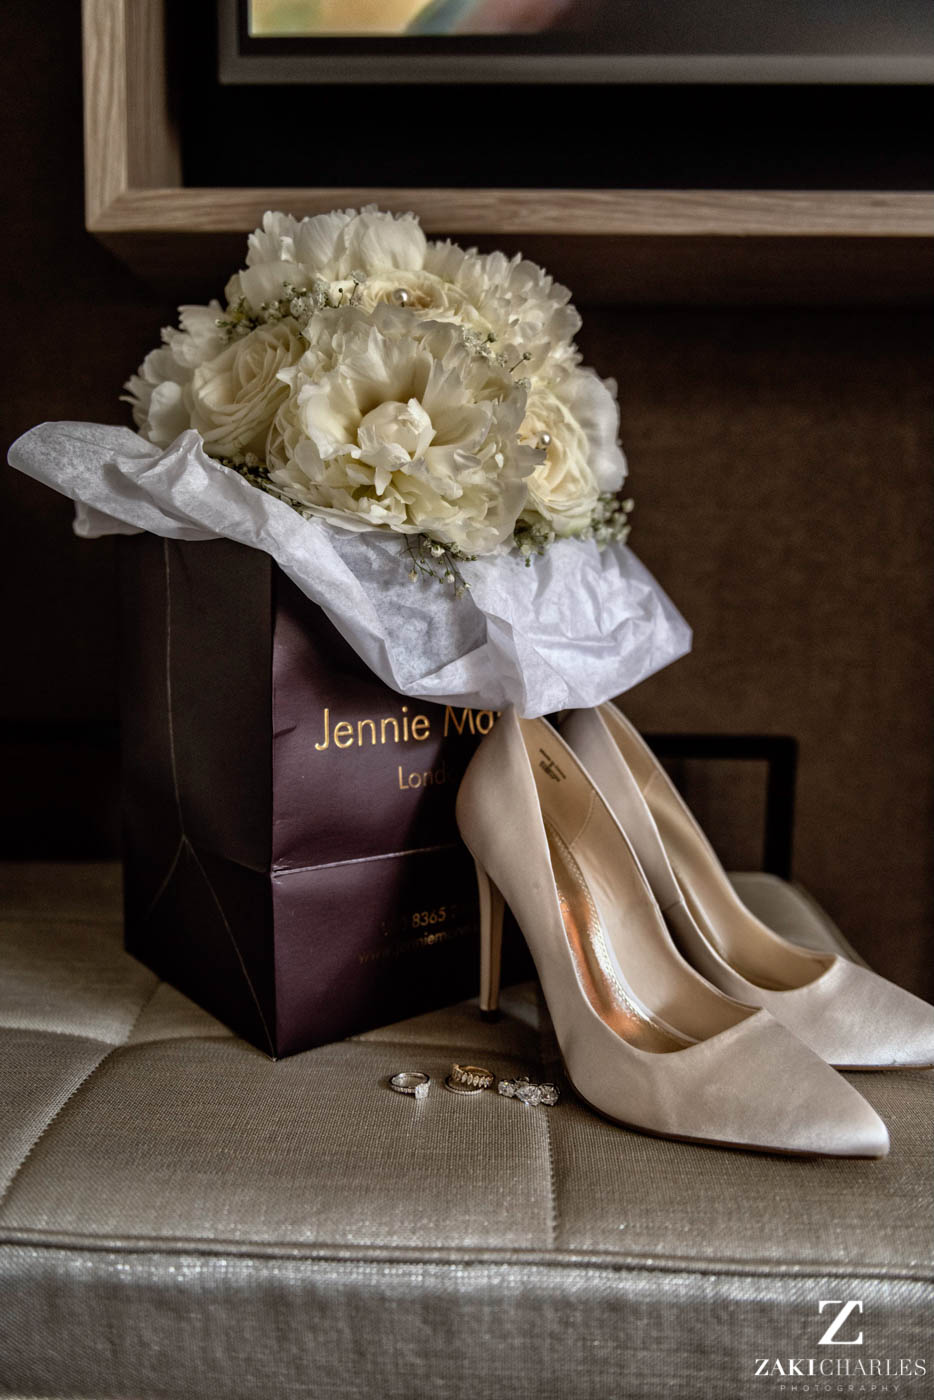 Details of the bride at Marriott Hotel Regents Park wedding venue